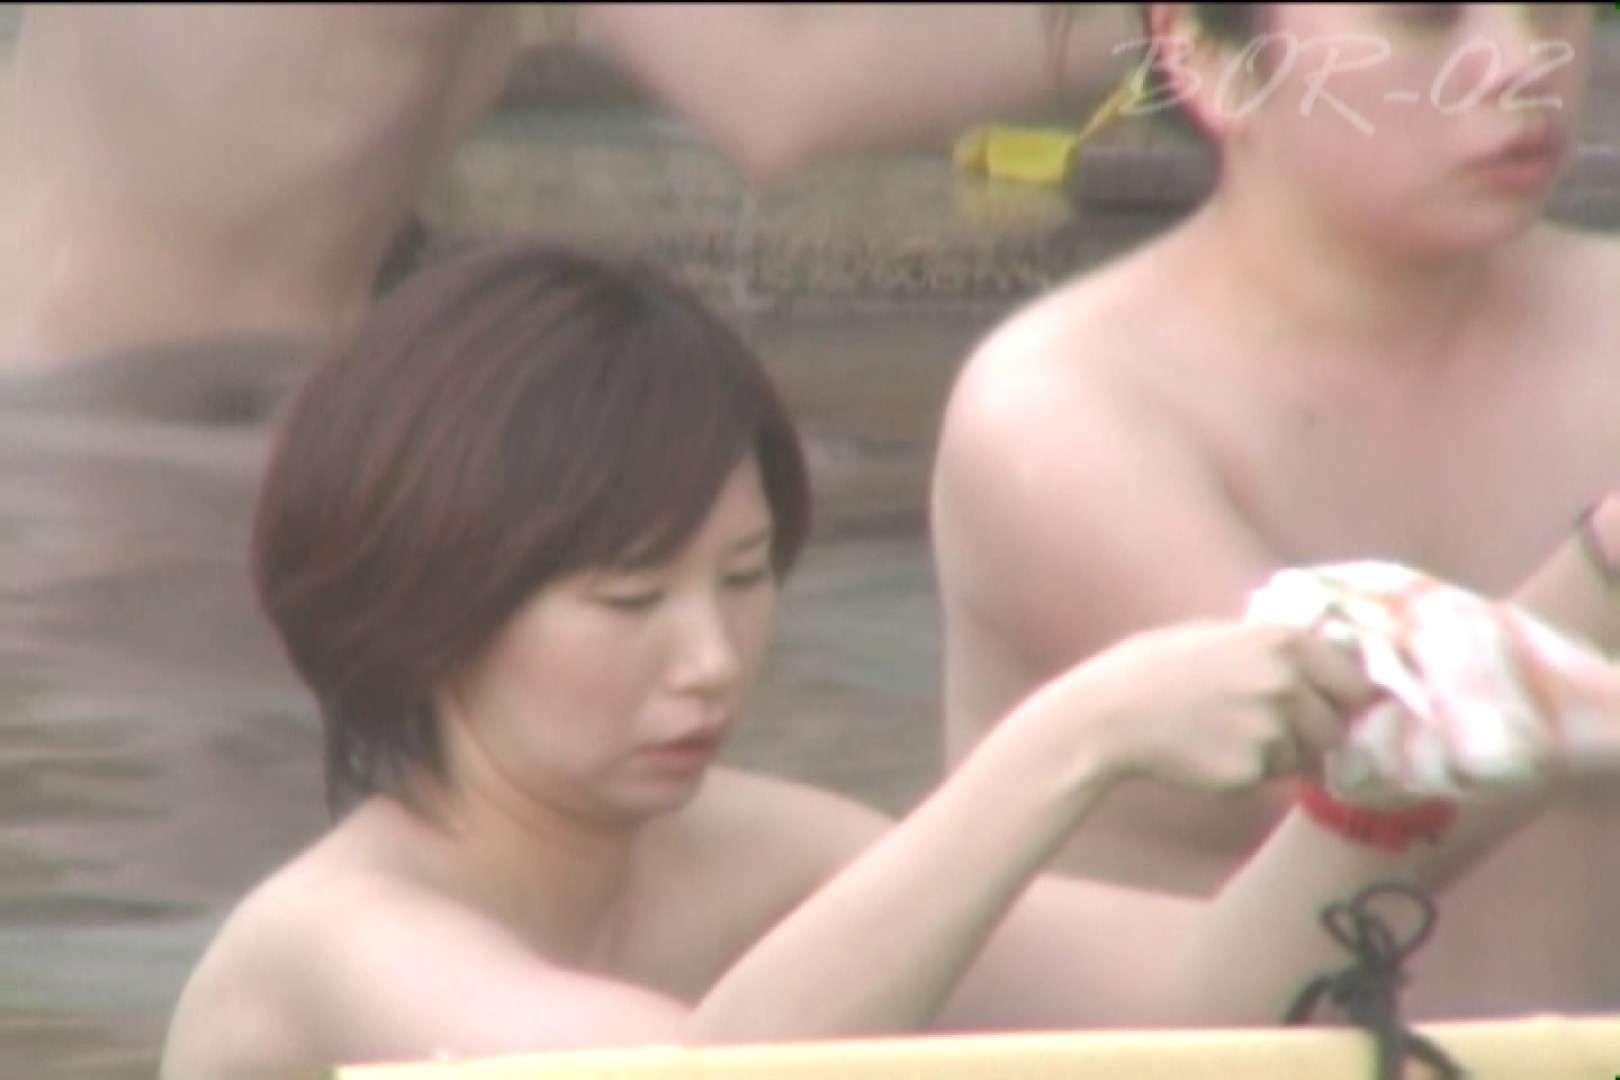 Aquaな露天風呂Vol.476 盗撮 濡れ場動画紹介 80画像 77